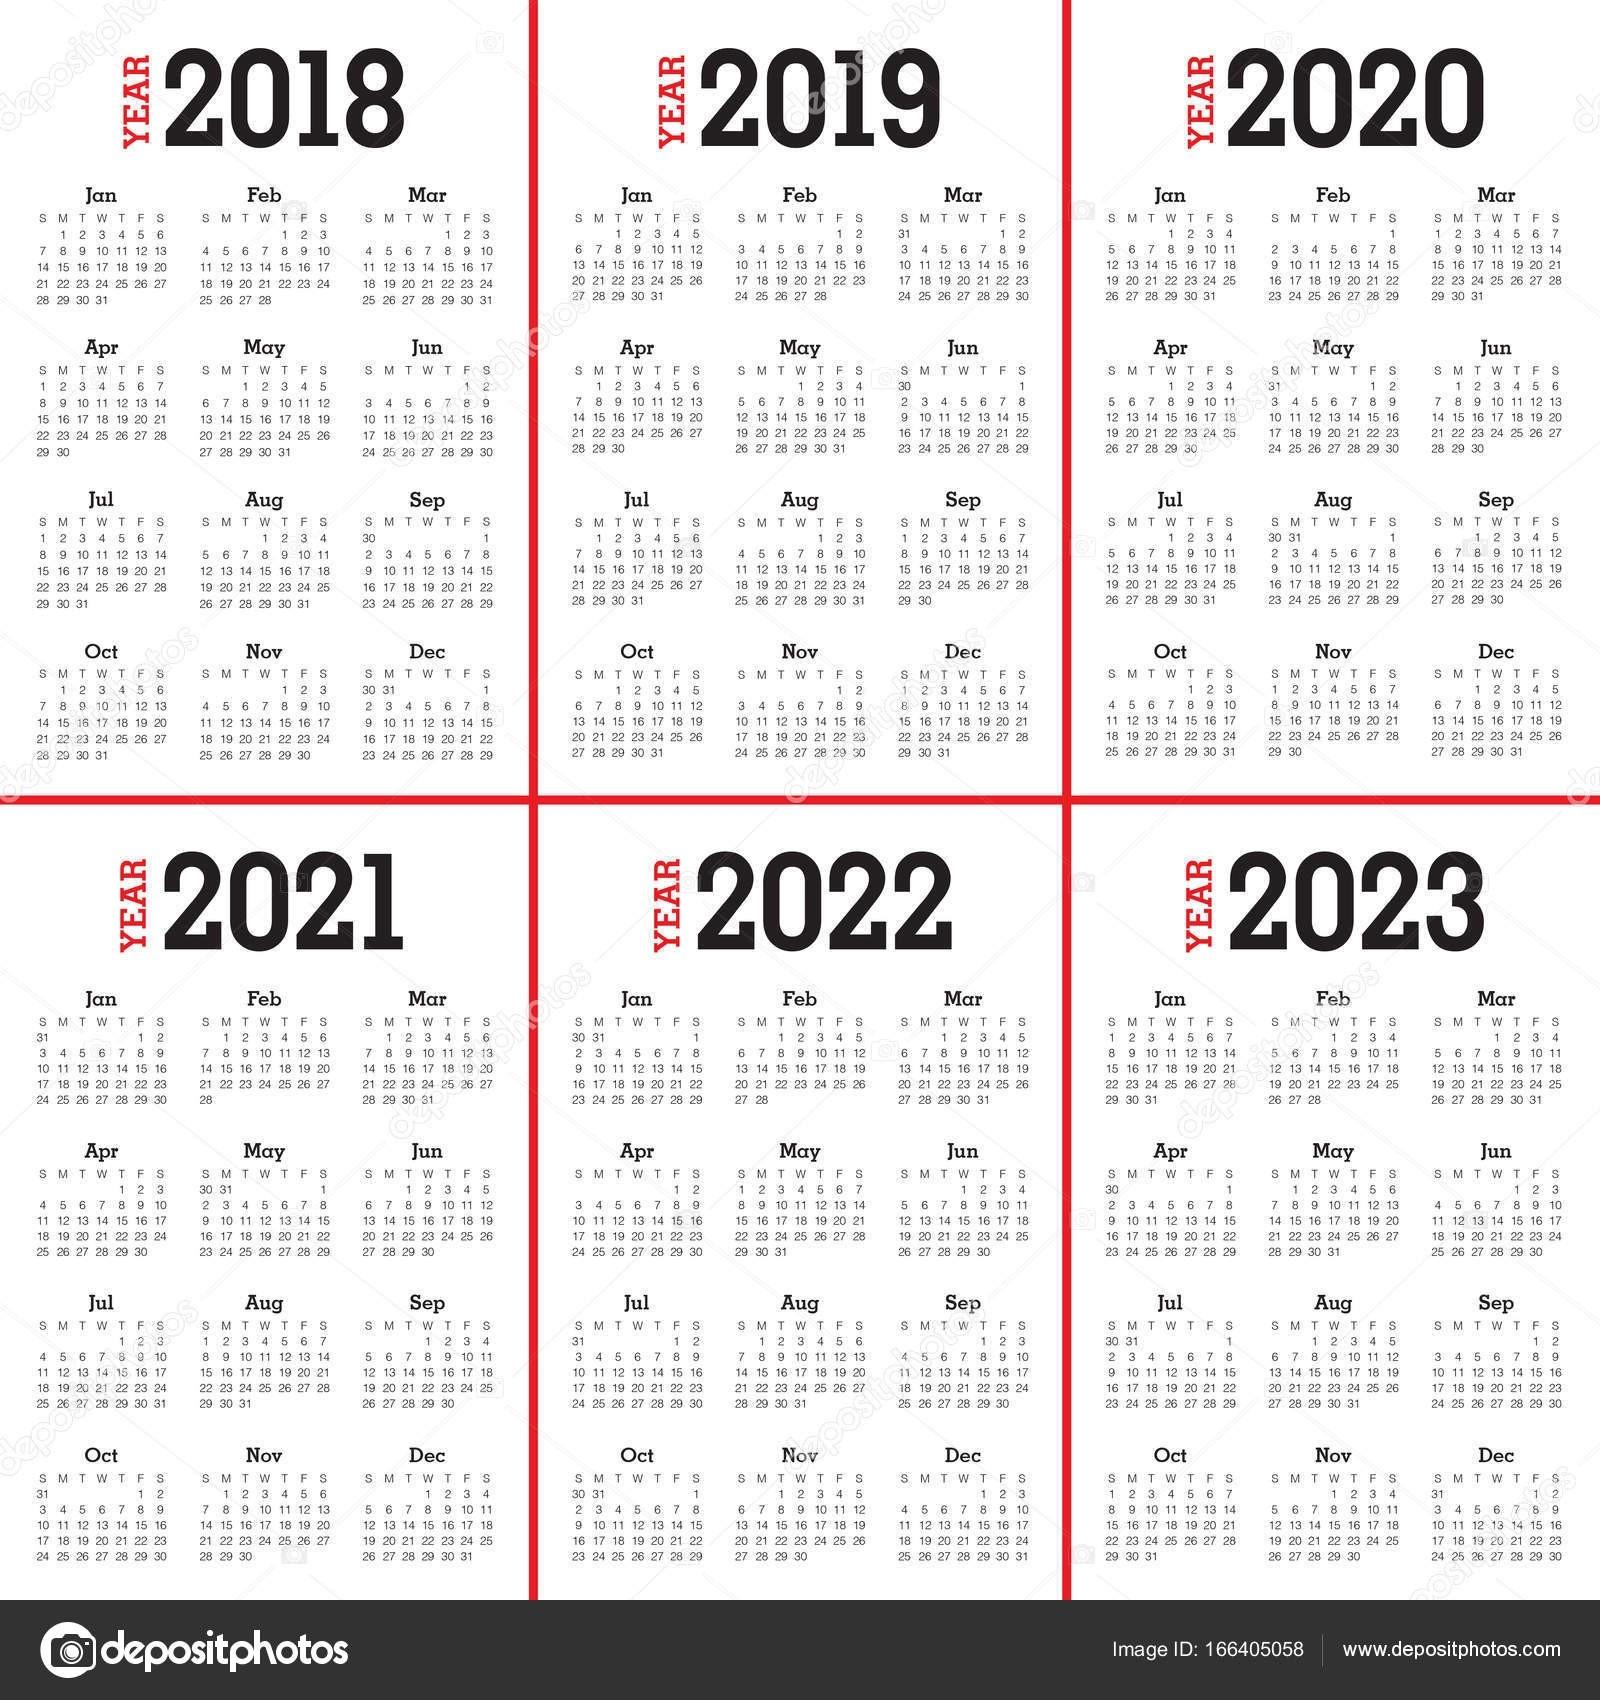 Three Year Calendar 2020 2021 2022   Calendar Printable Free-3 Year Calendar 2021